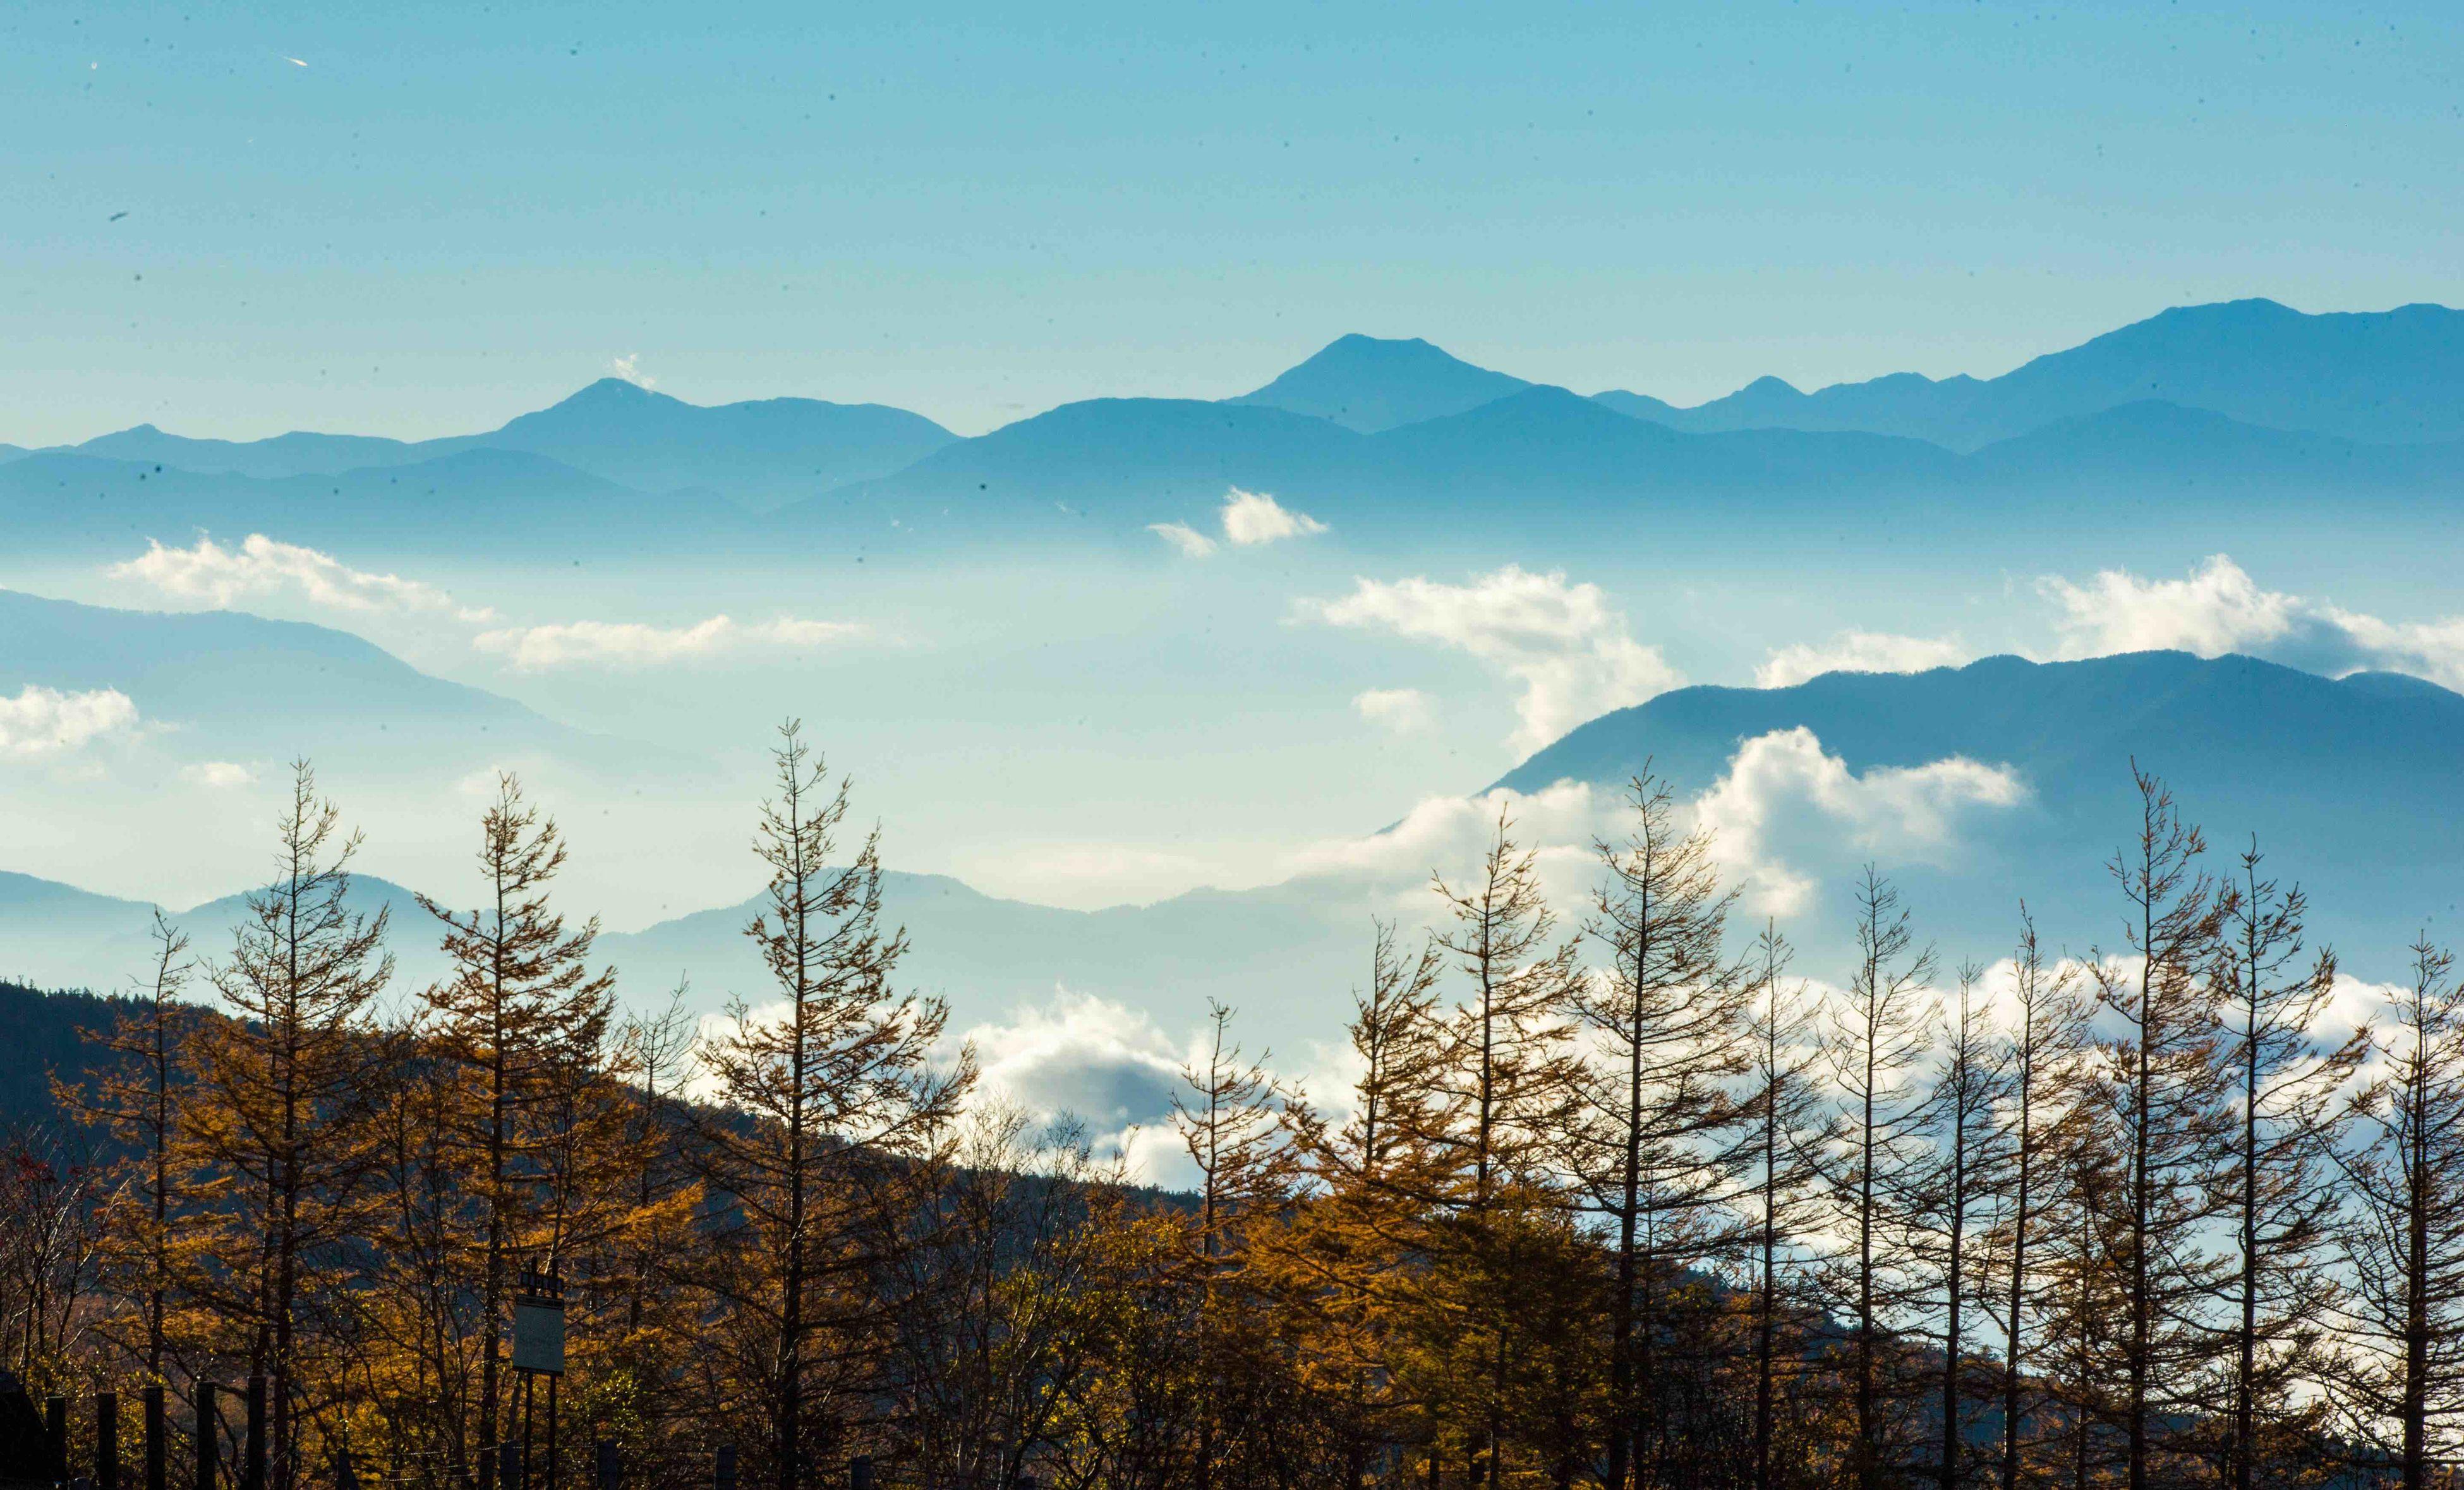 mountain, tranquil scene, mountain range, scenics, tranquility, beauty in nature, sky, nature, tree, landscape, blue, idyllic, non-urban scene, snowcapped mountain, snow, majestic, winter, season, growth, cold temperature